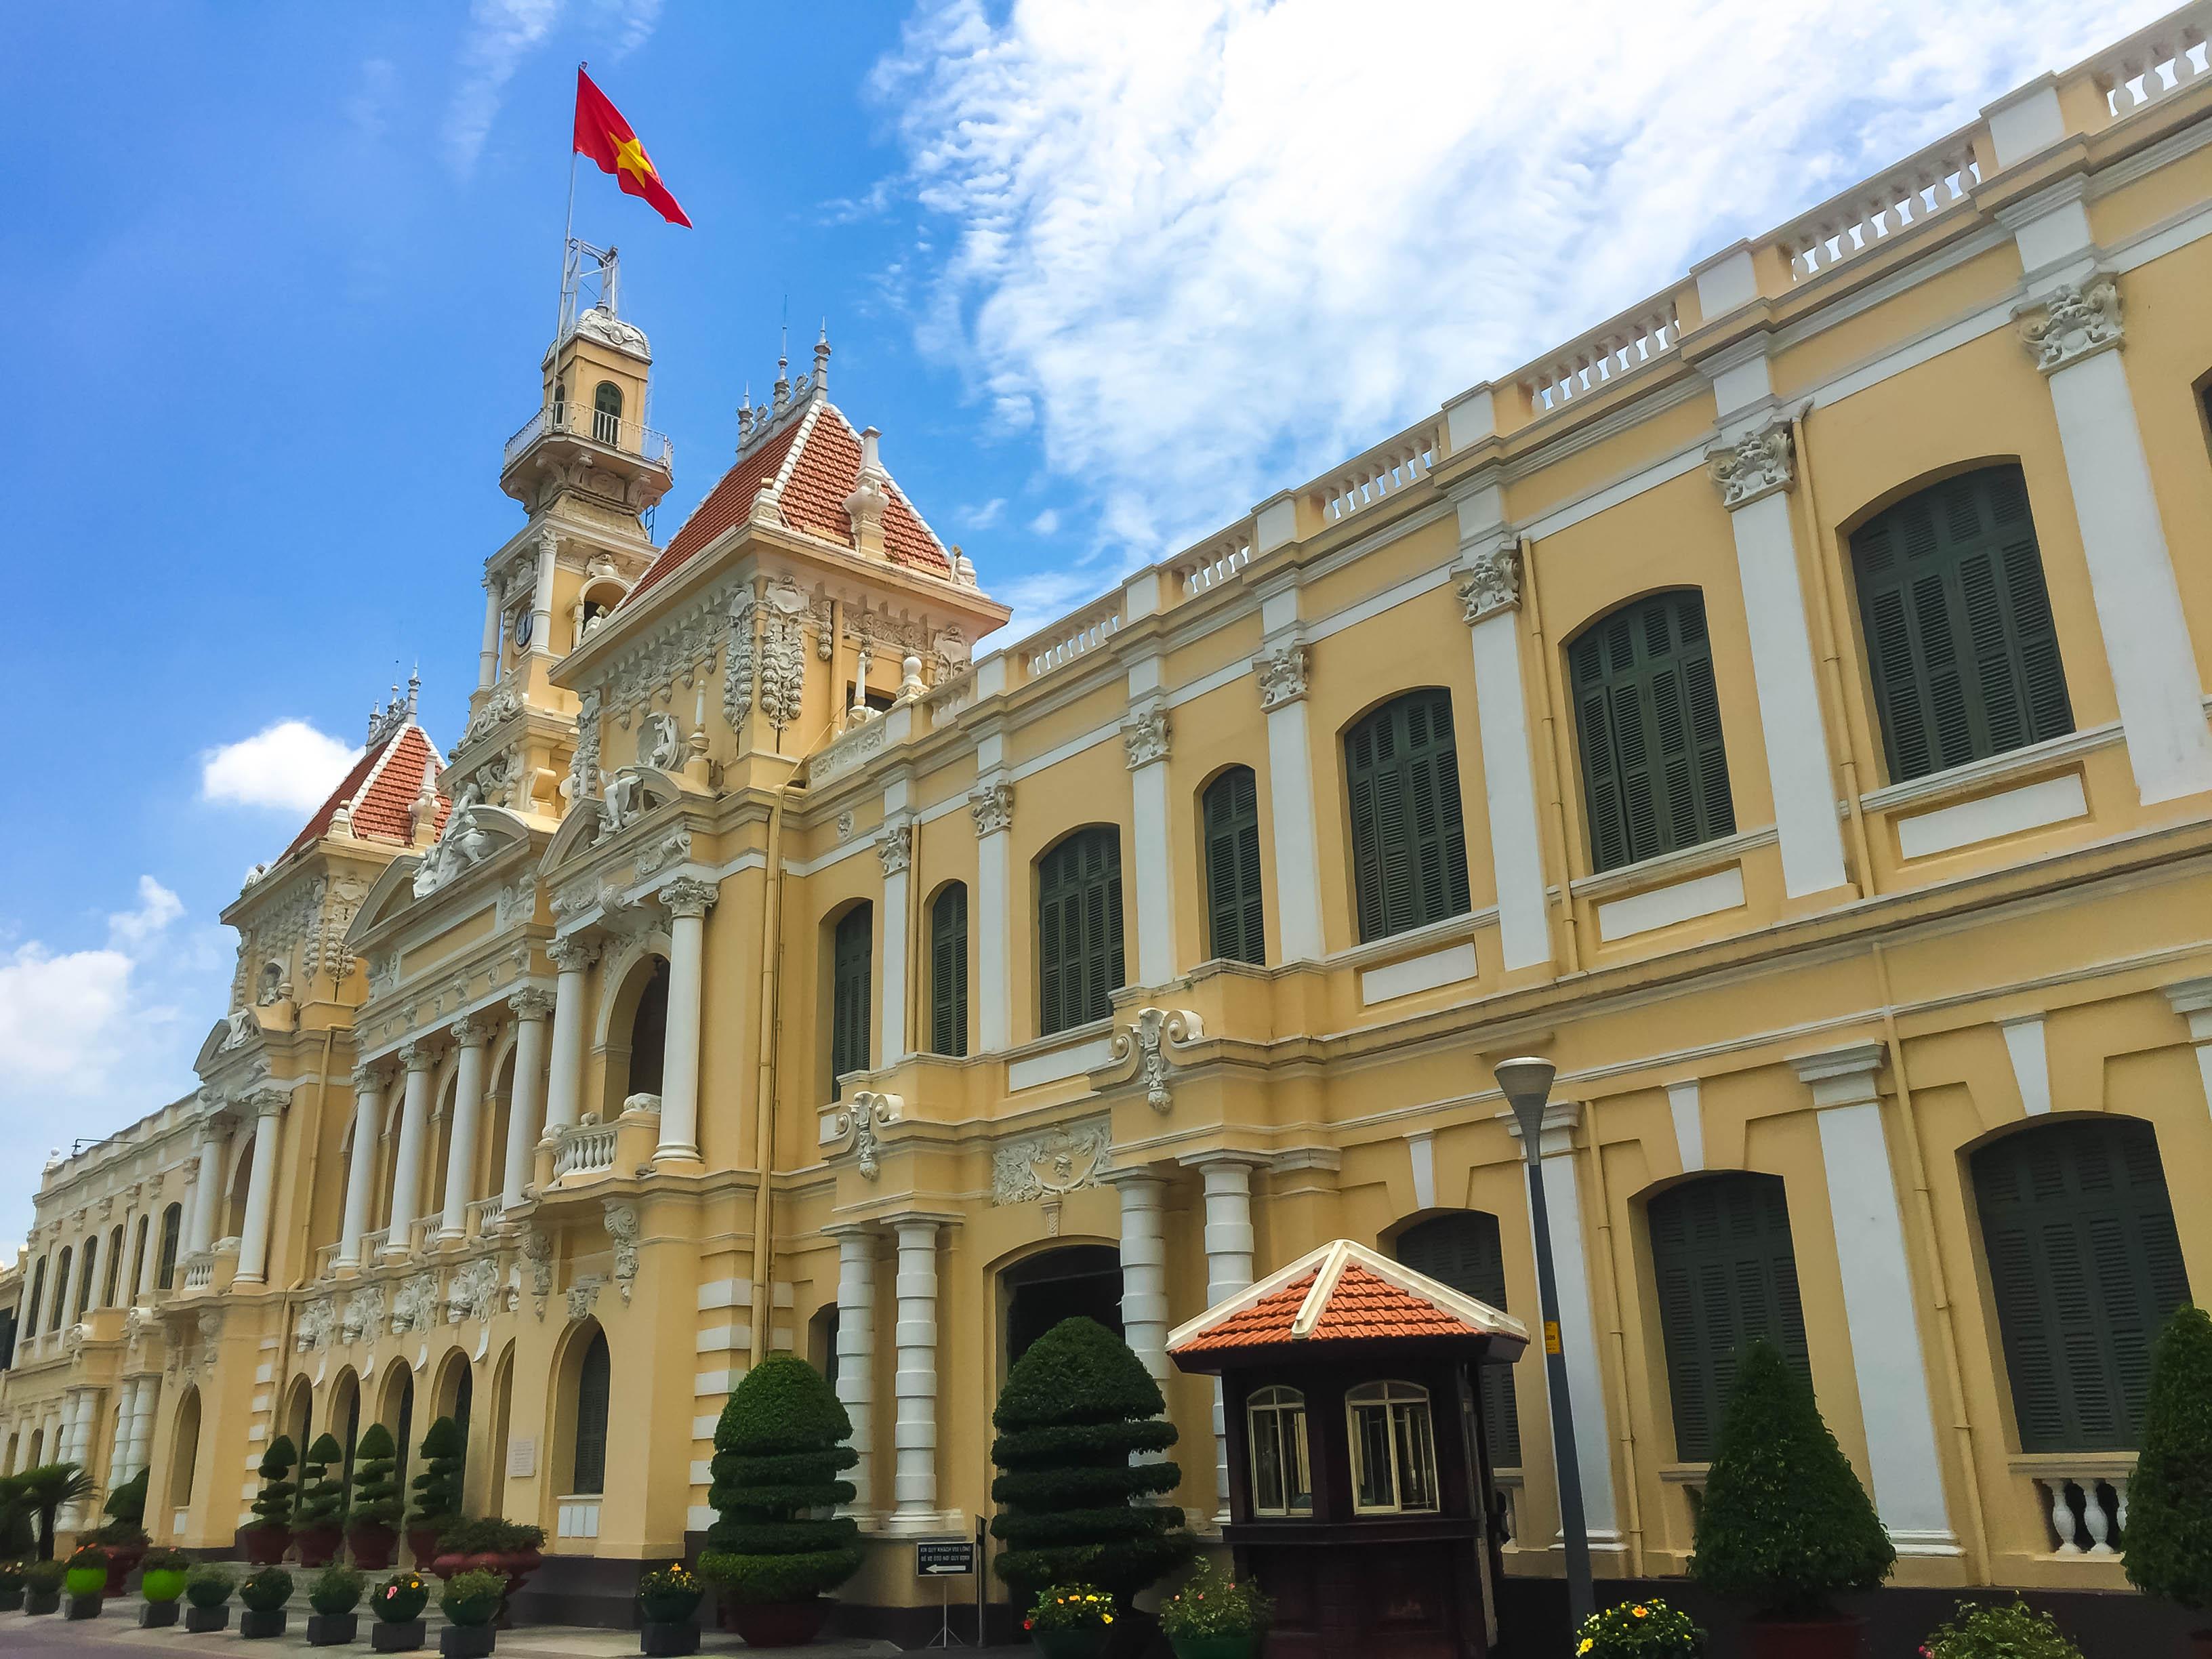 an image Krazelle took of Ho Chi Minh City, Vietnam